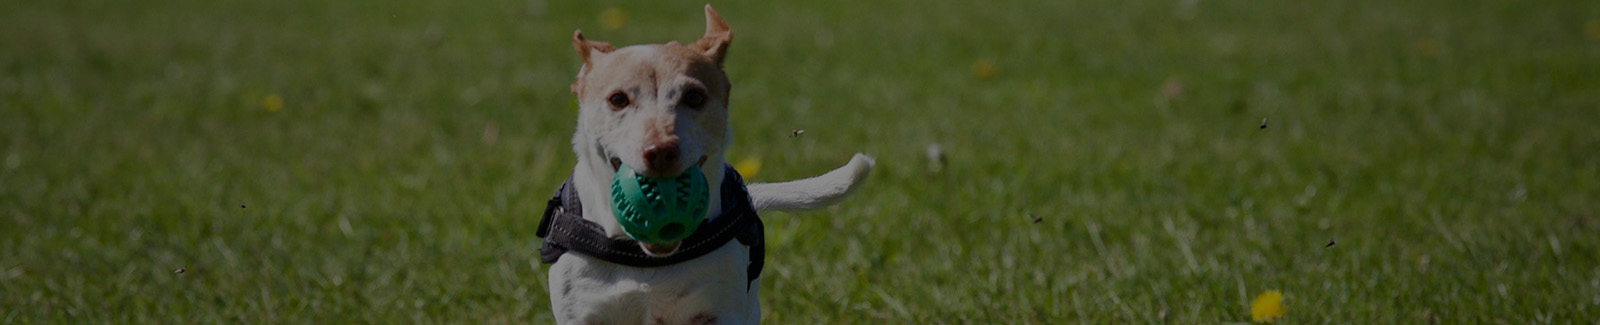 dog running with training ball